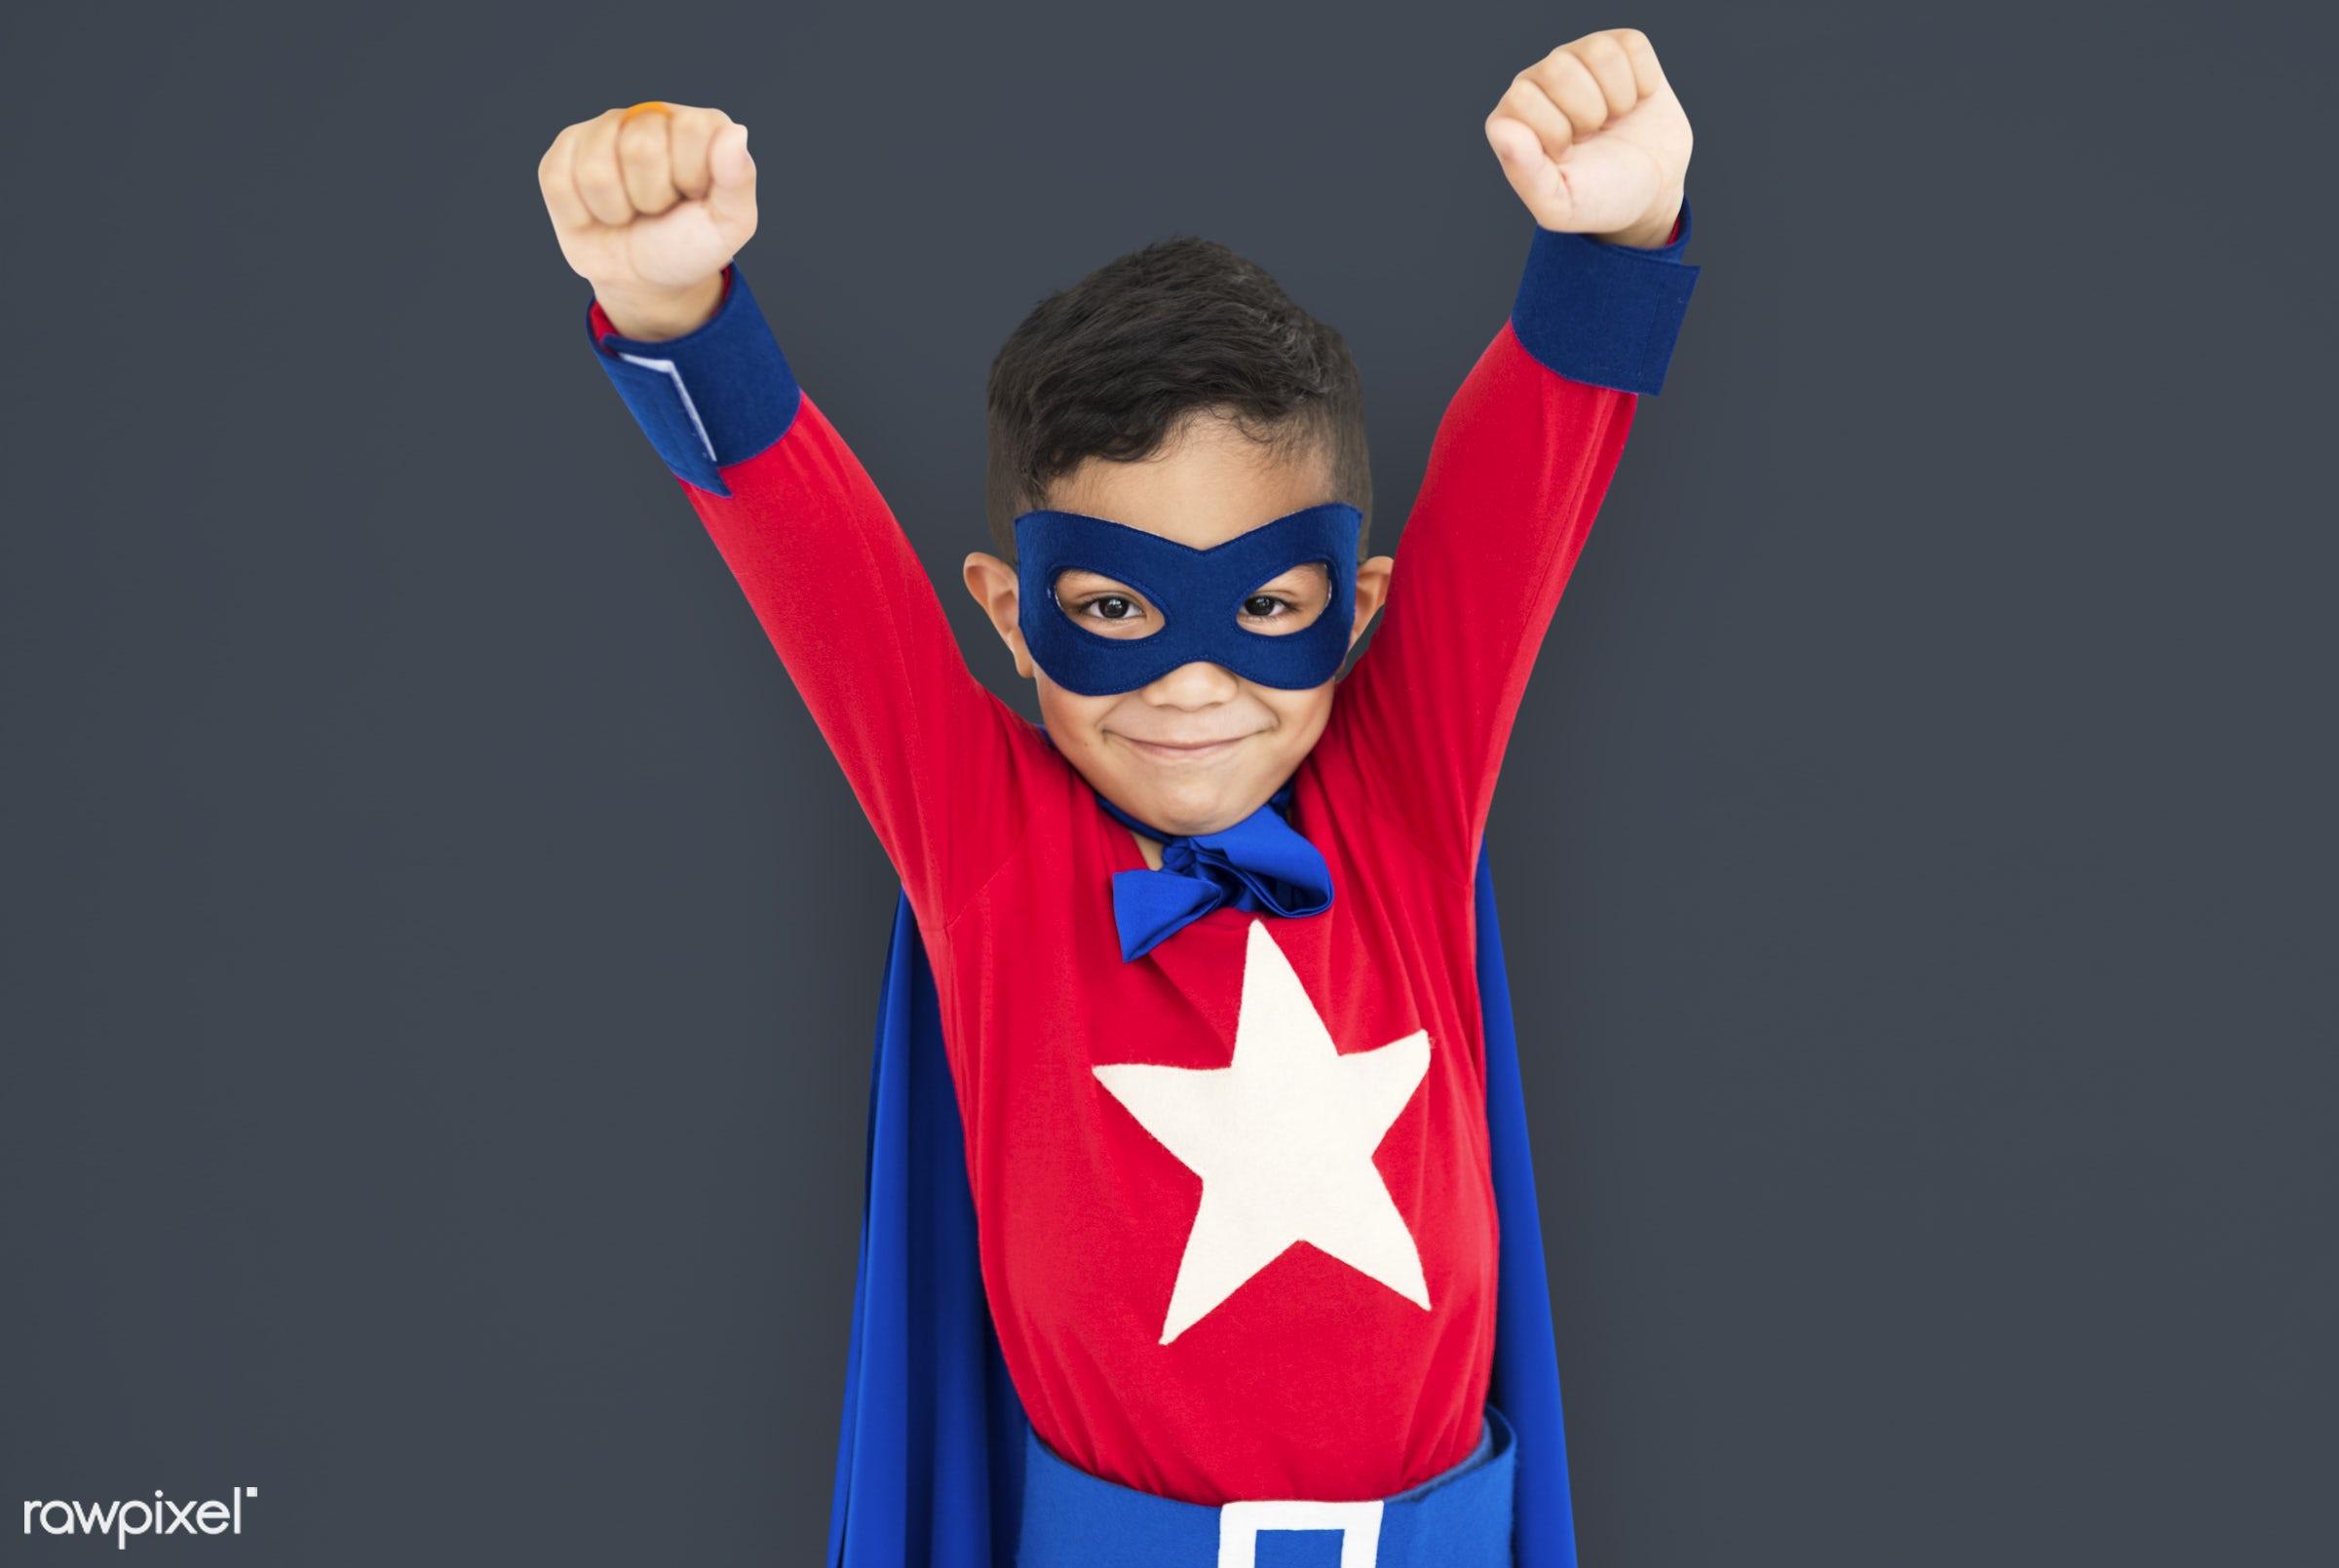 children, courageous, adolescence, kid, child, inspiration, leader, idol, childhood, superhero, isolated, hero, capable,...